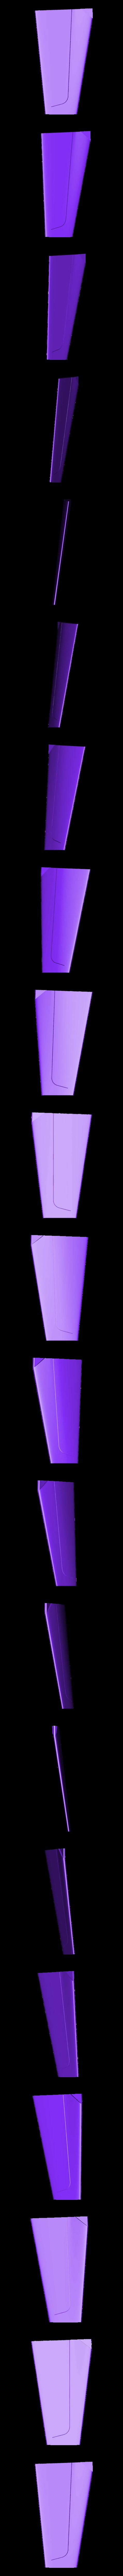 Estabilizador_Horizontal_Der.stl Download free STL file Easy to print Cessna Citation SII 1/64 aircraft scale model • 3D print template, guaro3d